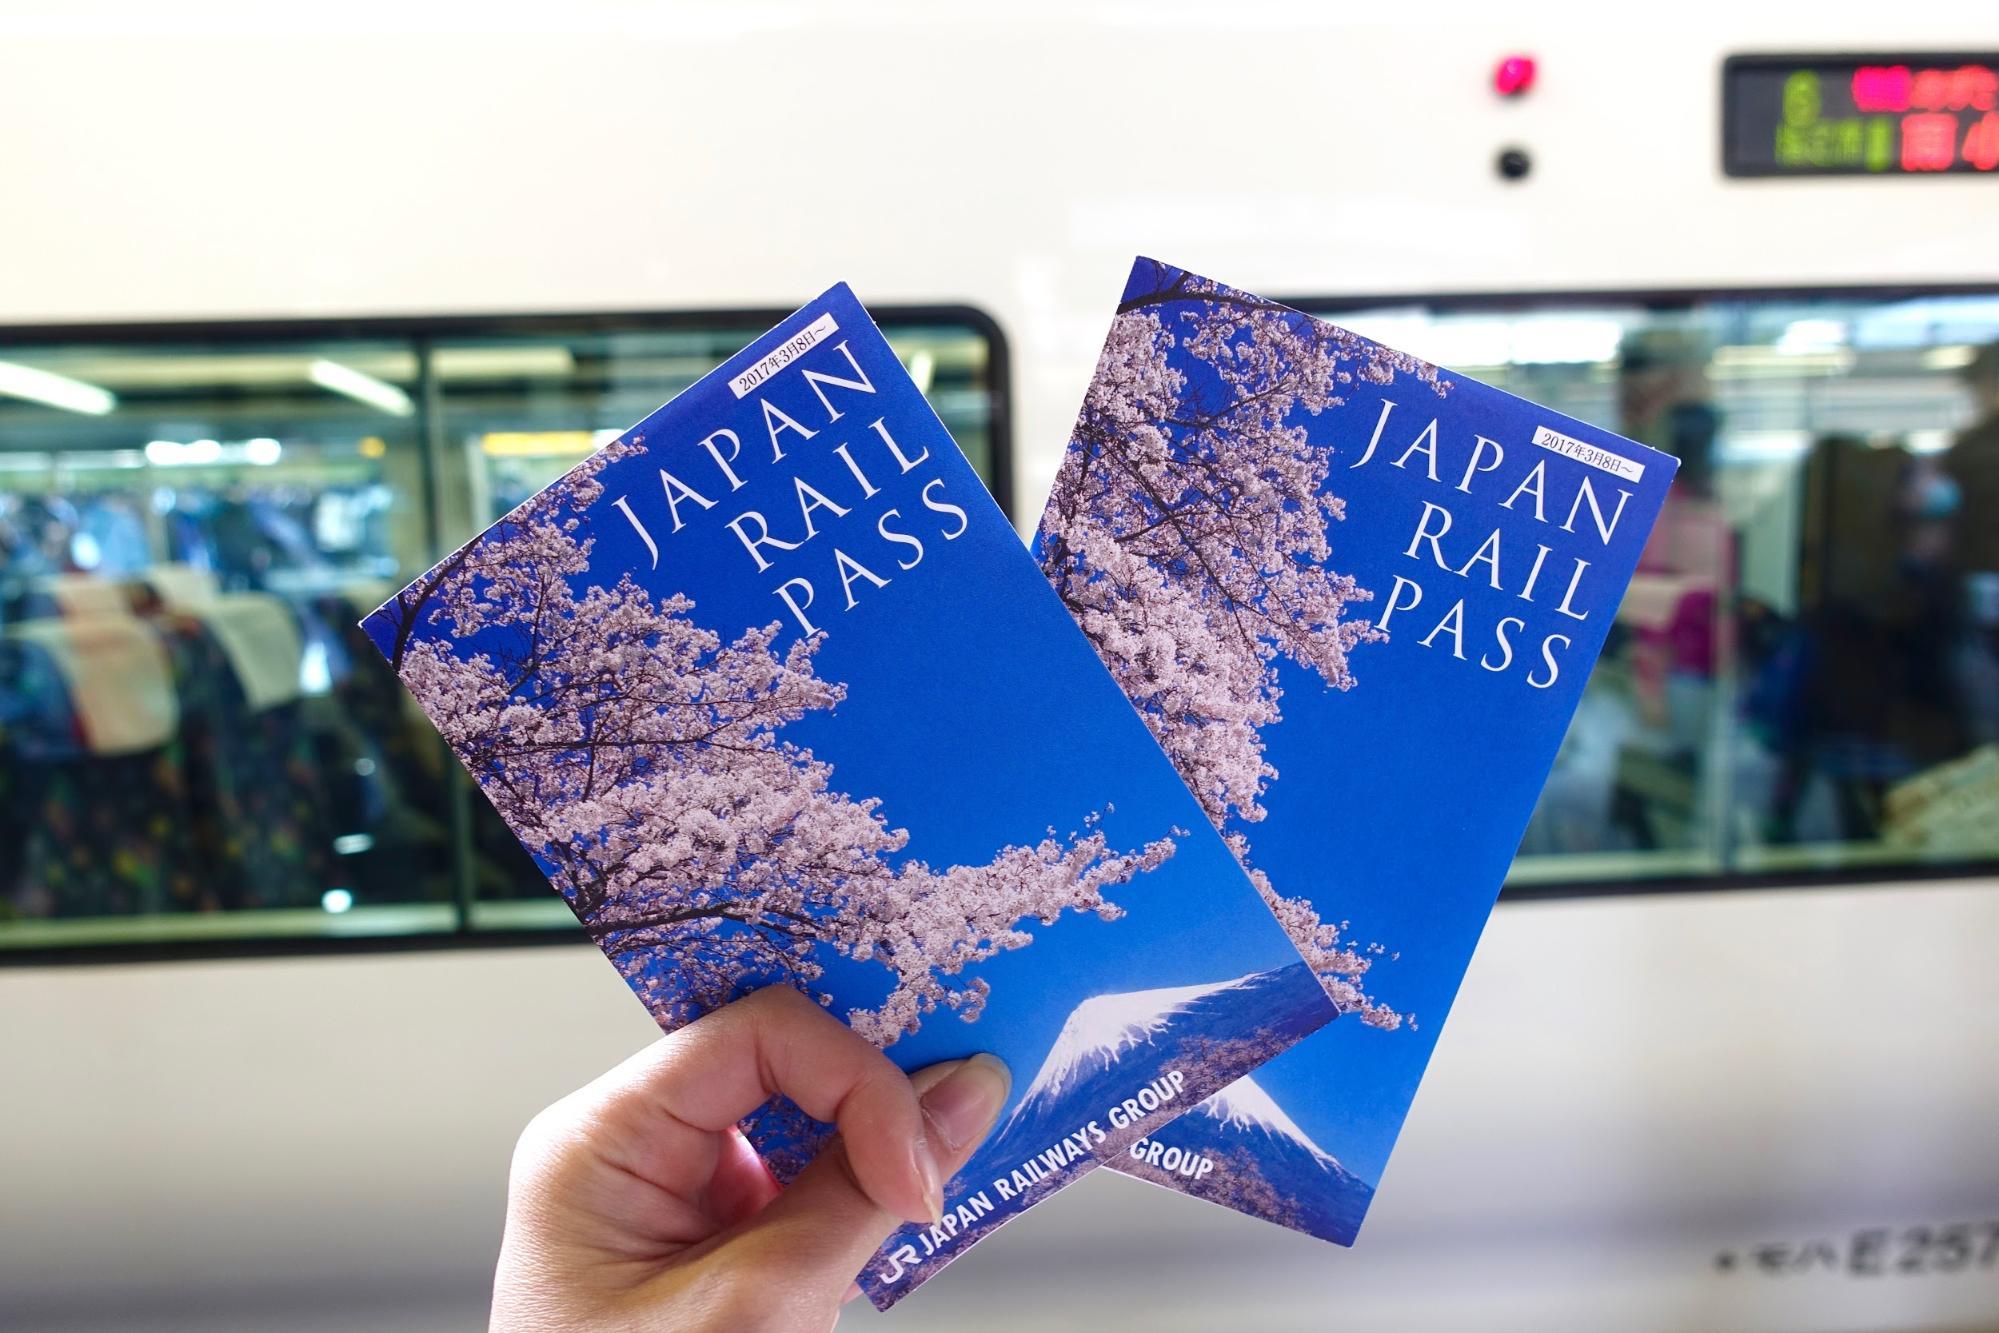 Japan Rail Pass Indonesia image